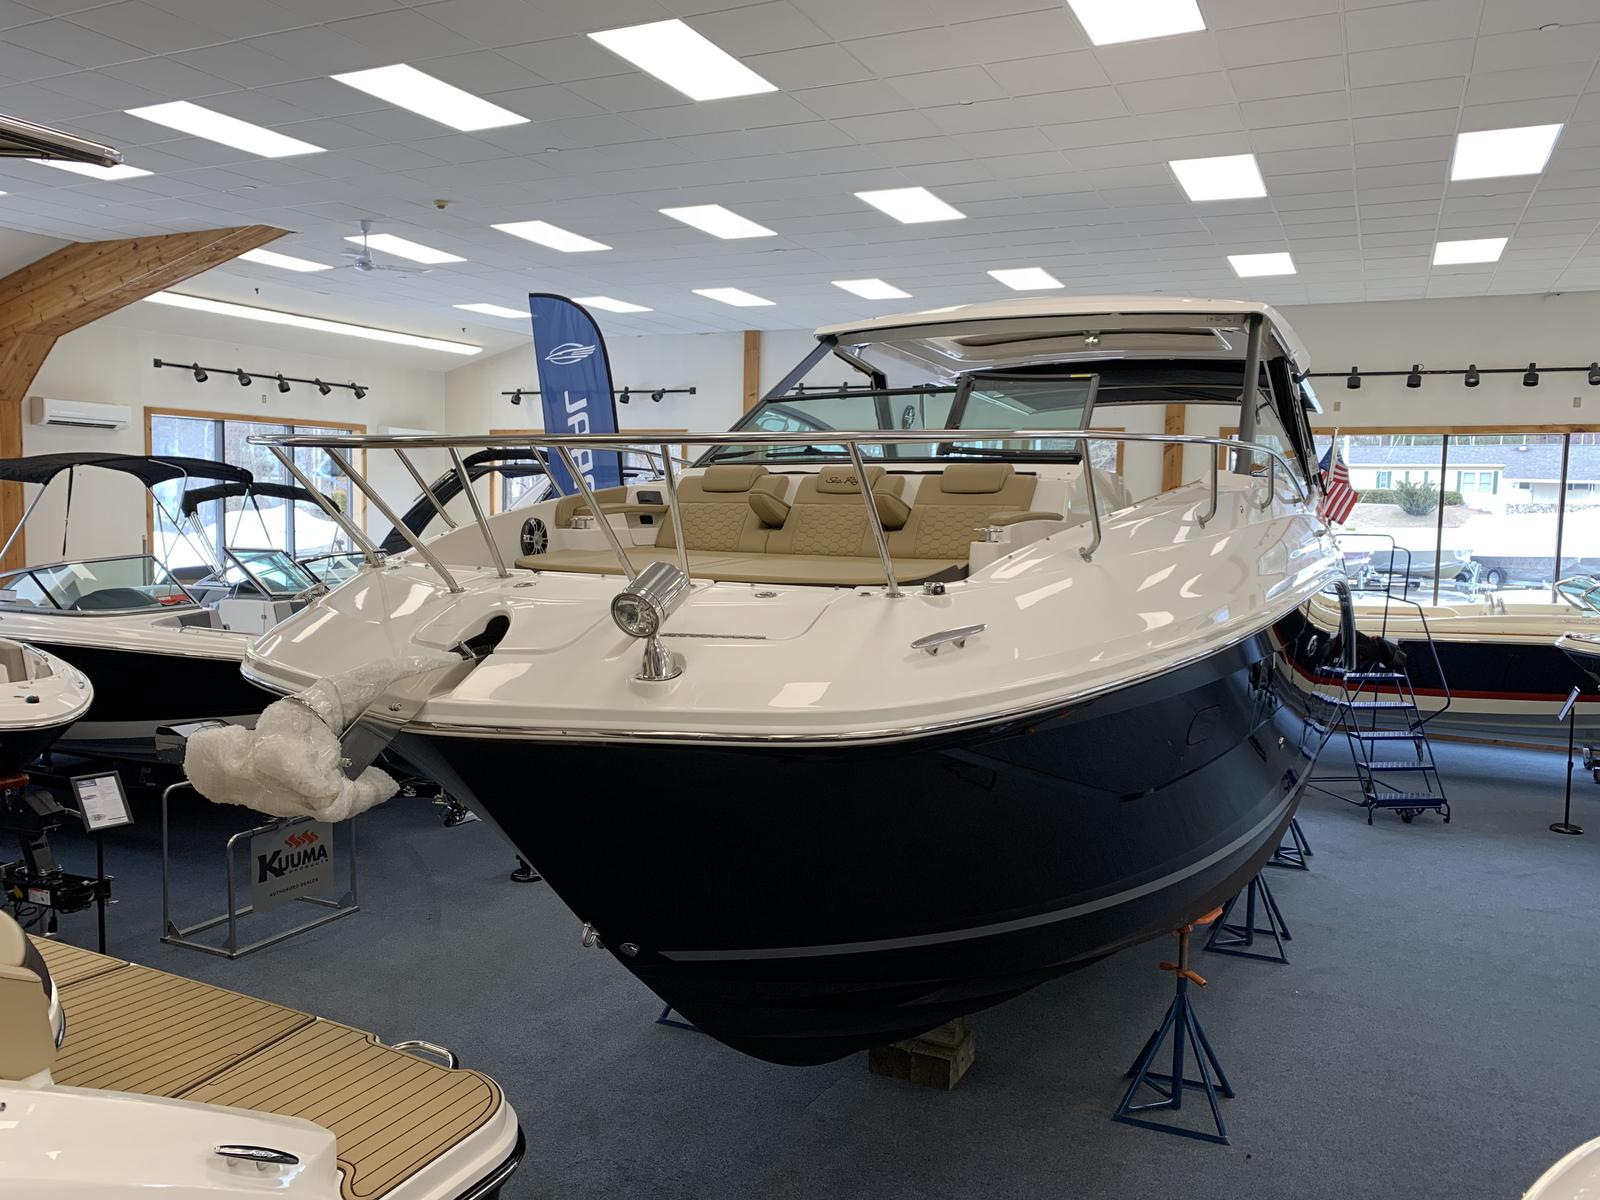 2019 Sea Ray Sundancer 320 For Sale In Colchester Vt Saba Marine